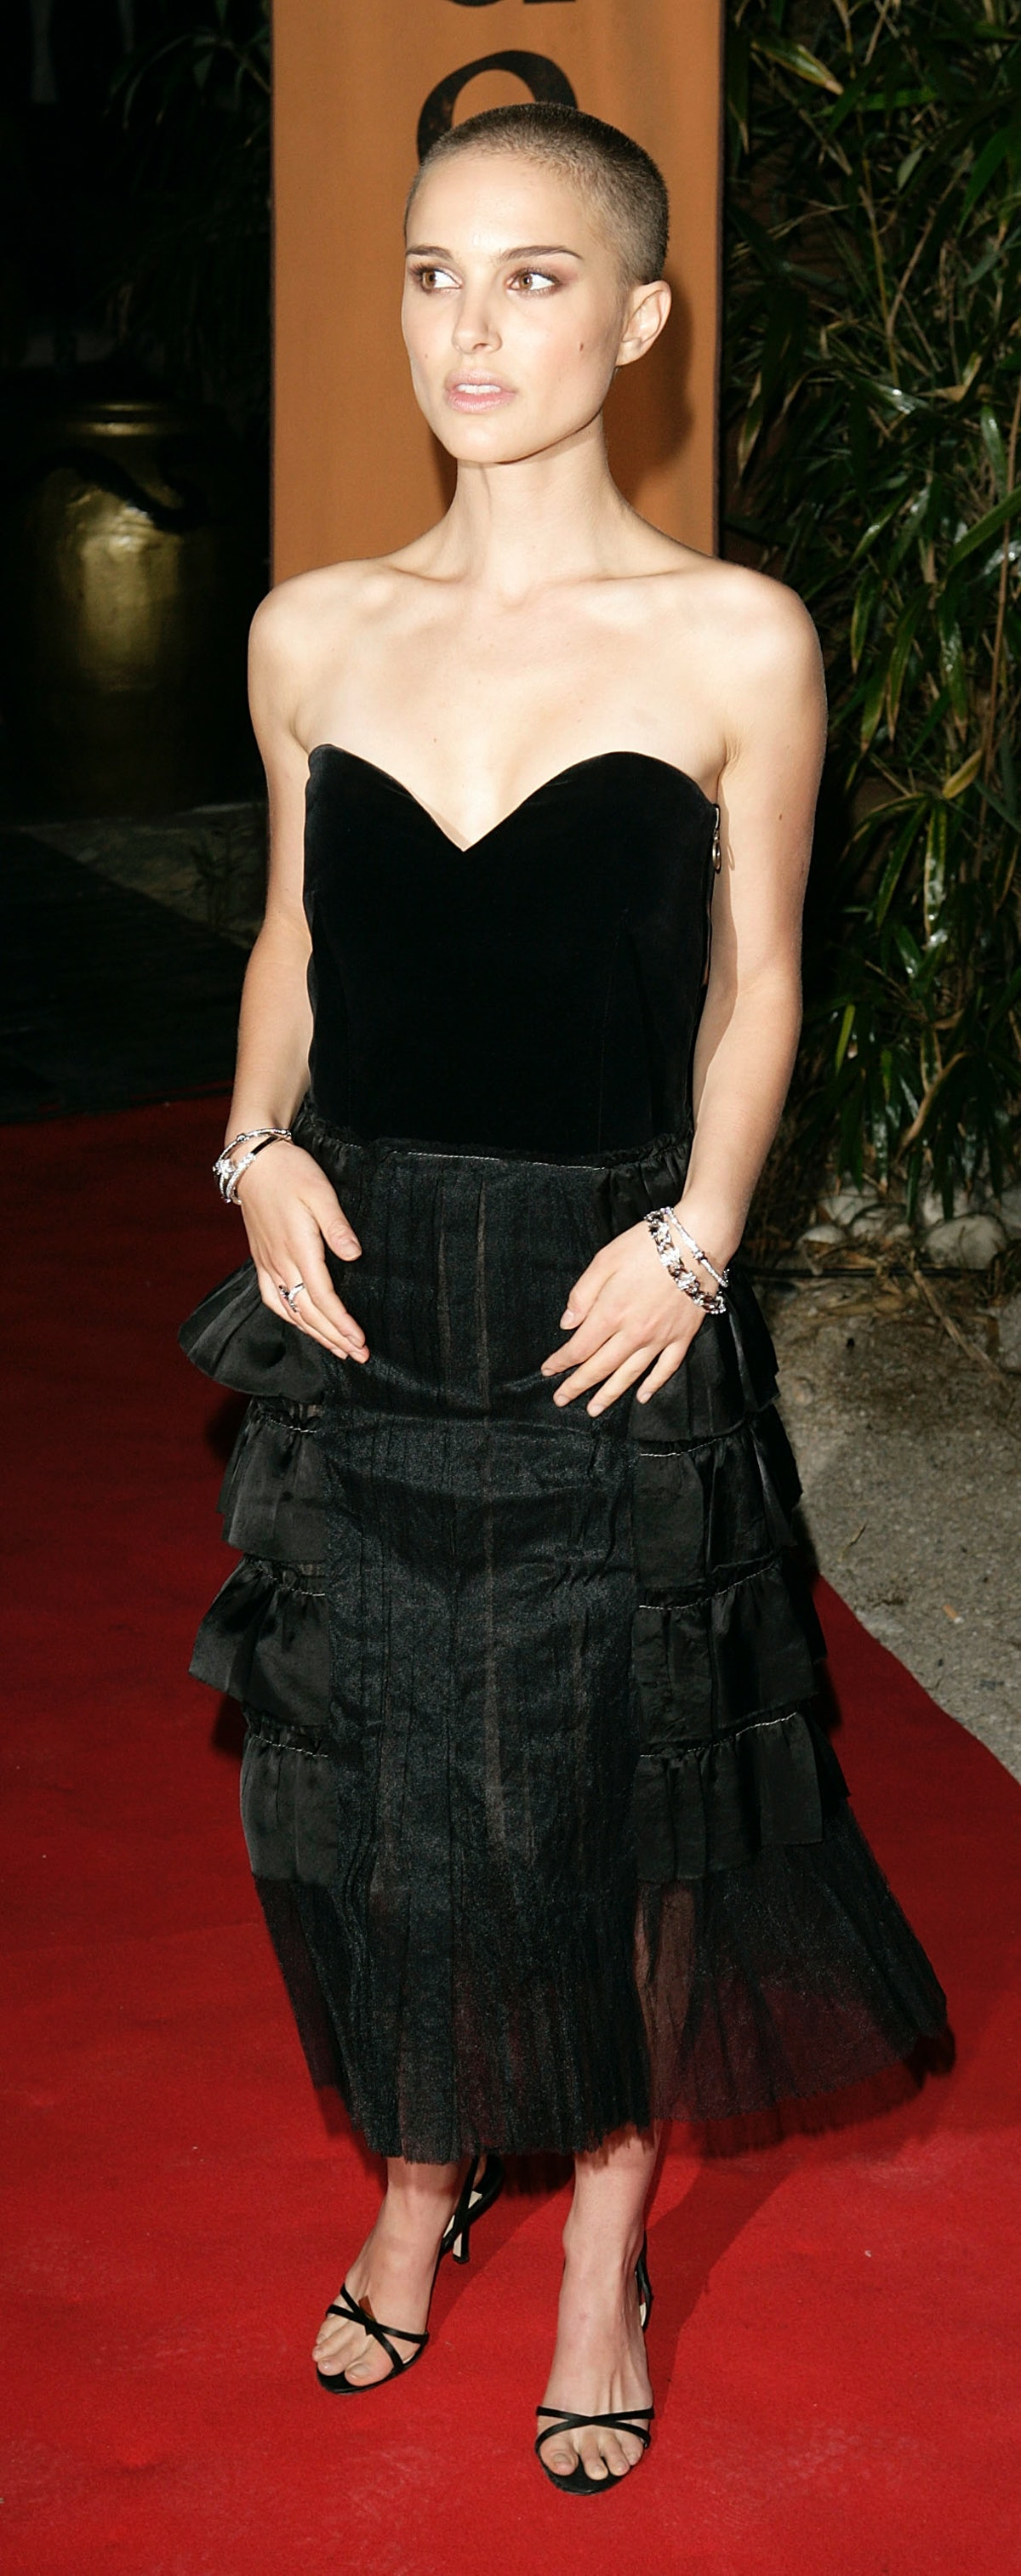 Natalie Portman with shaved head.